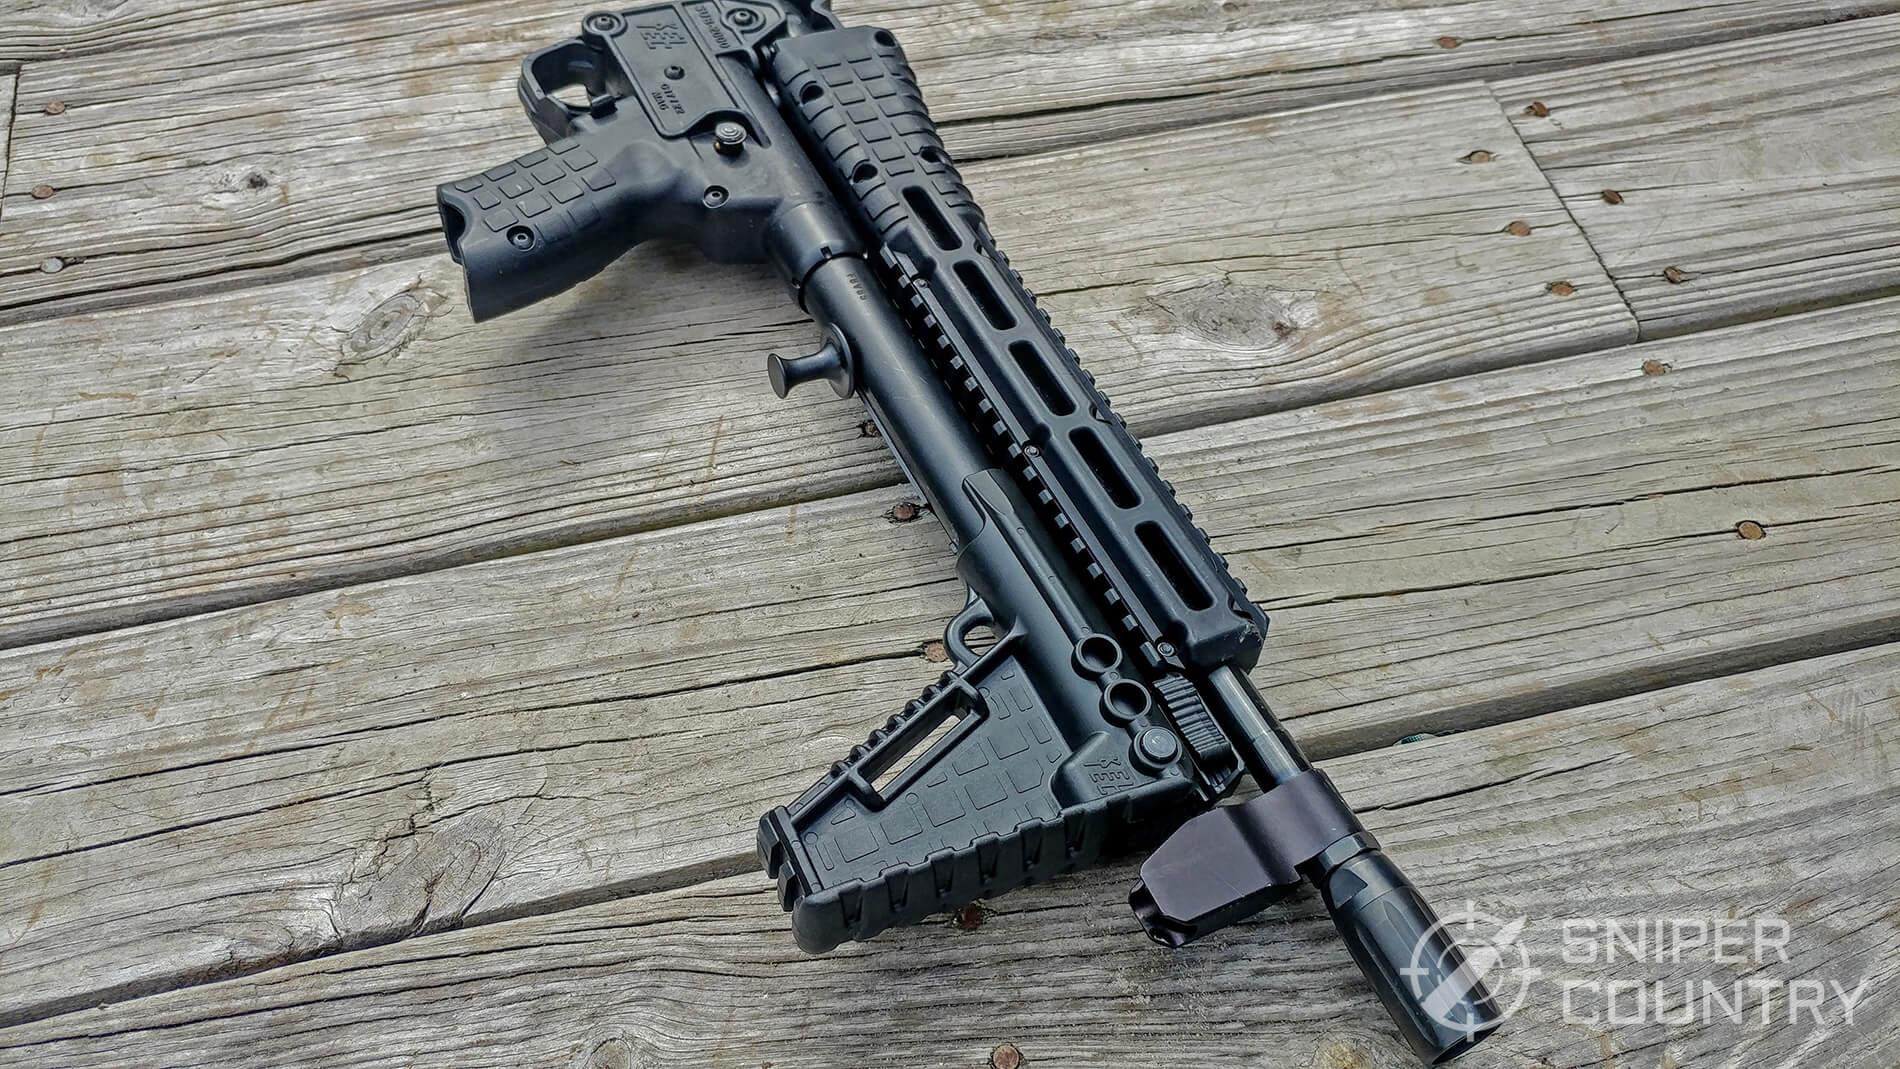 Review: Kel-Tec Sub 2000 | Sniper Country